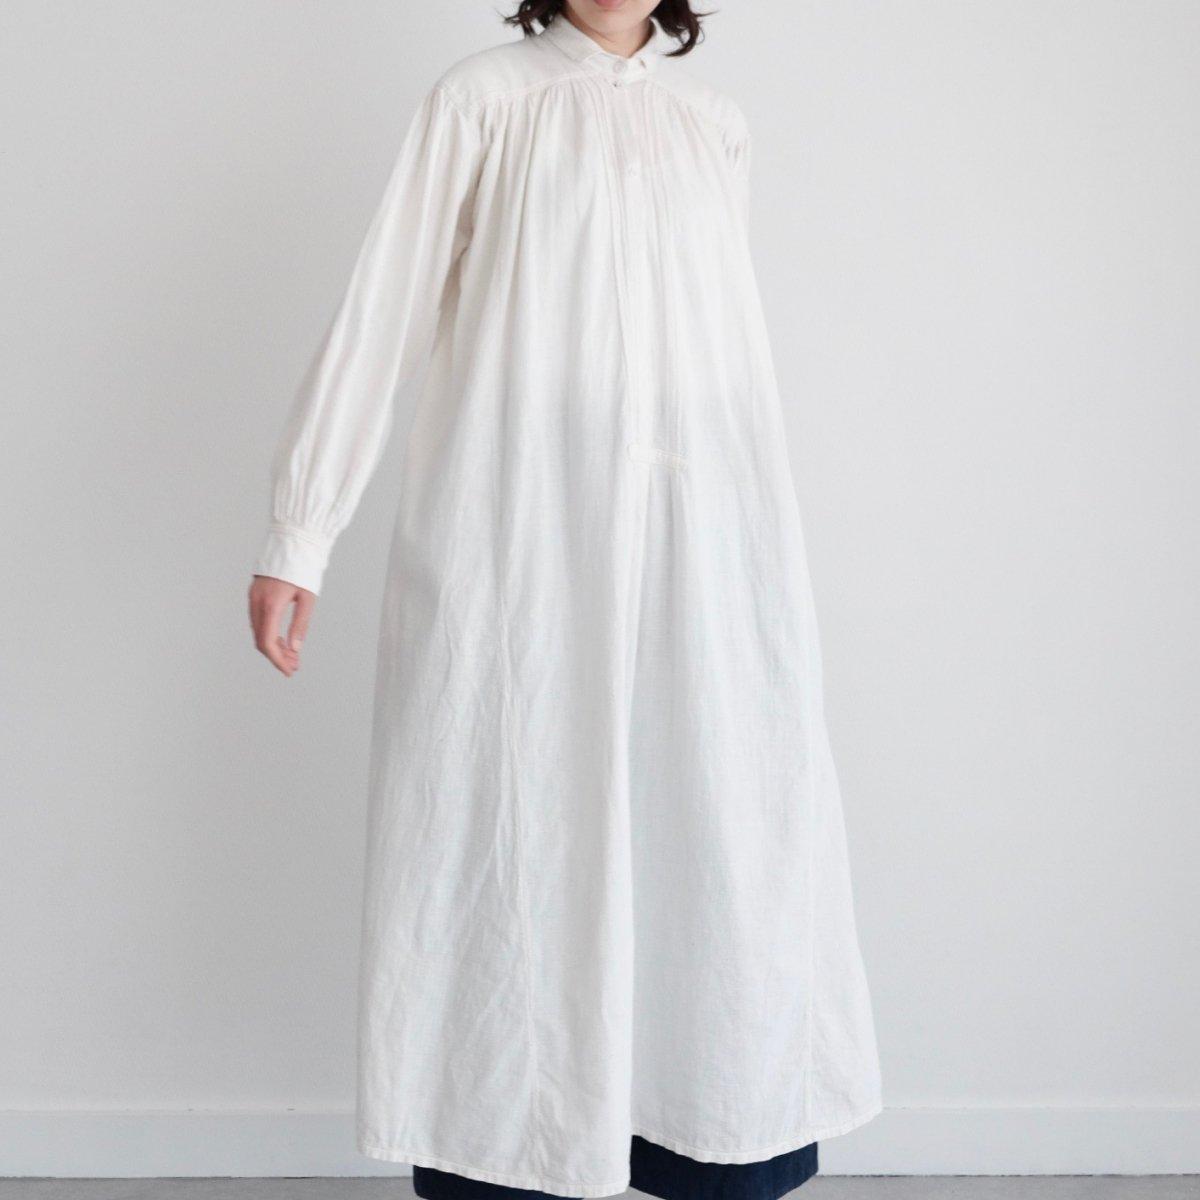 [VINTAGE] Romanian Rural White Cotton dress